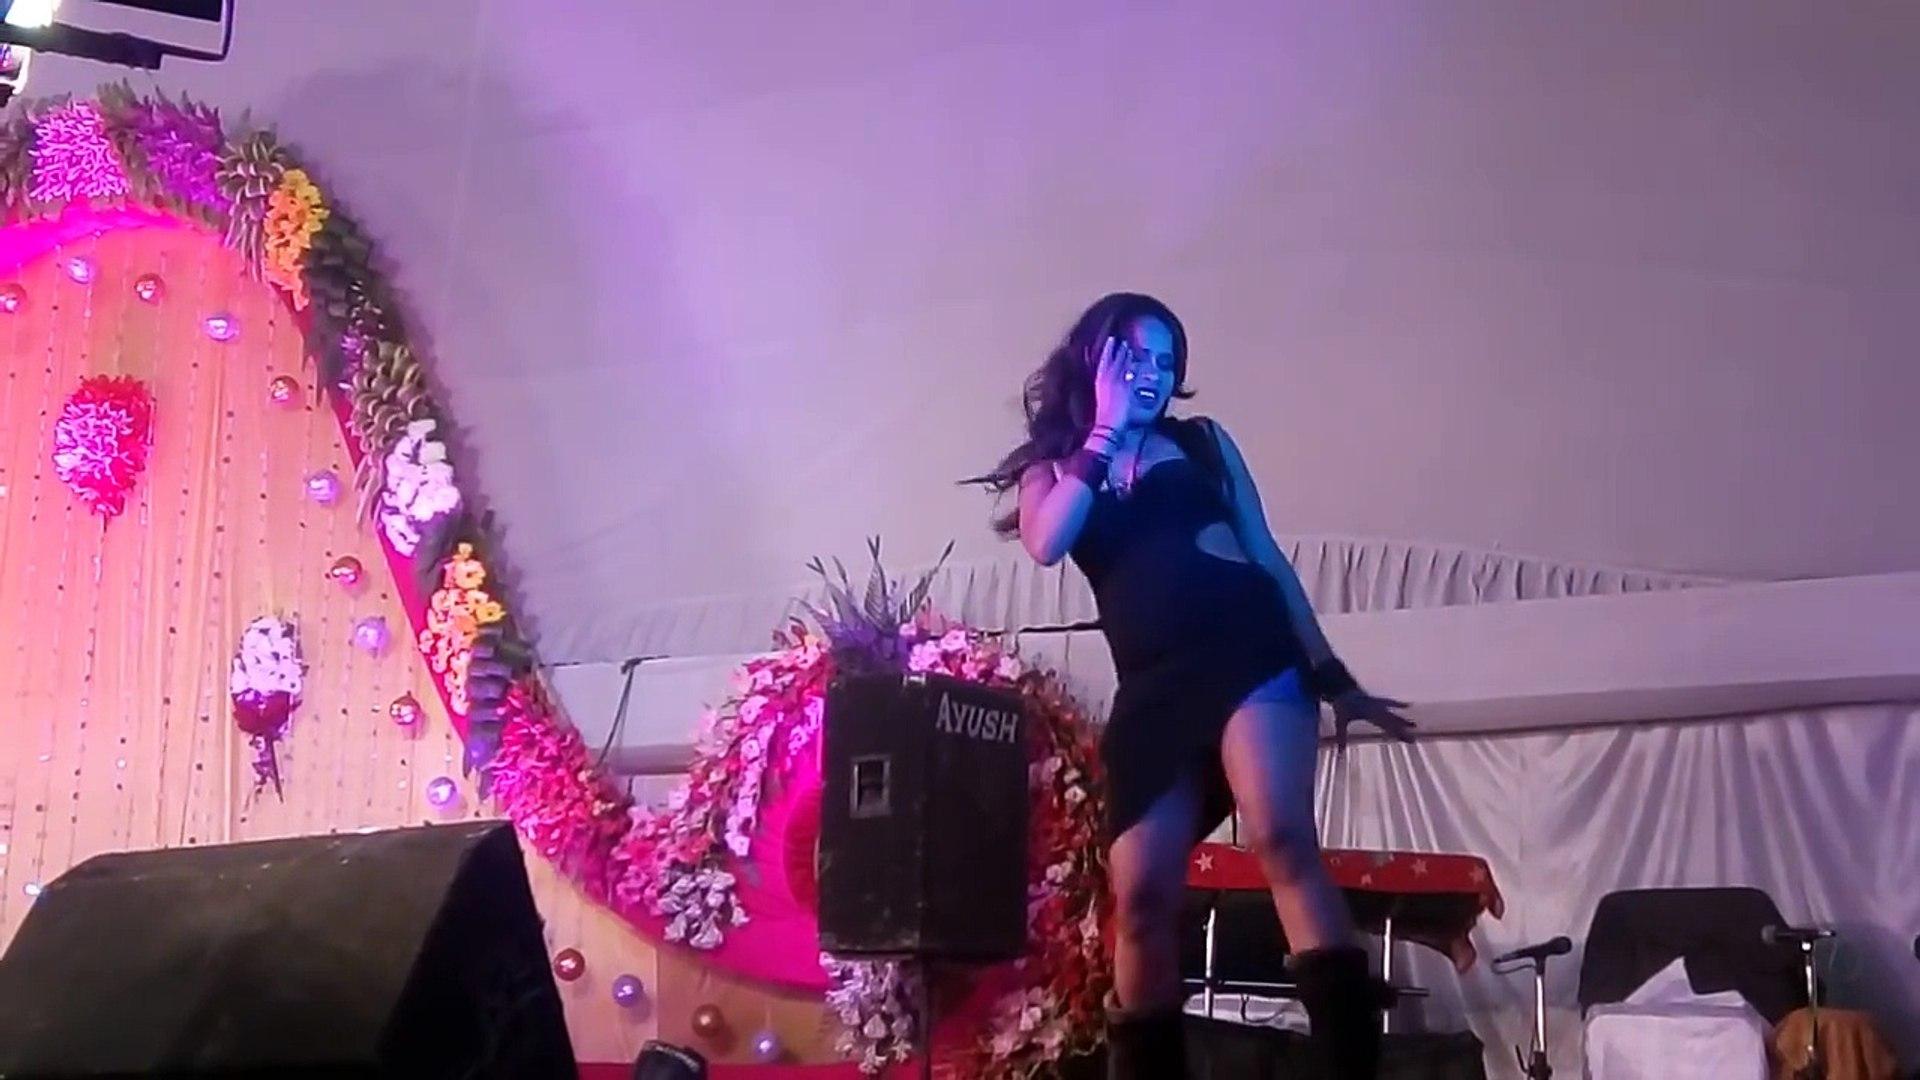 सेक्सी -Bhojpuri new arkesta dance - sexy hot girl dance _new bhojpuri song